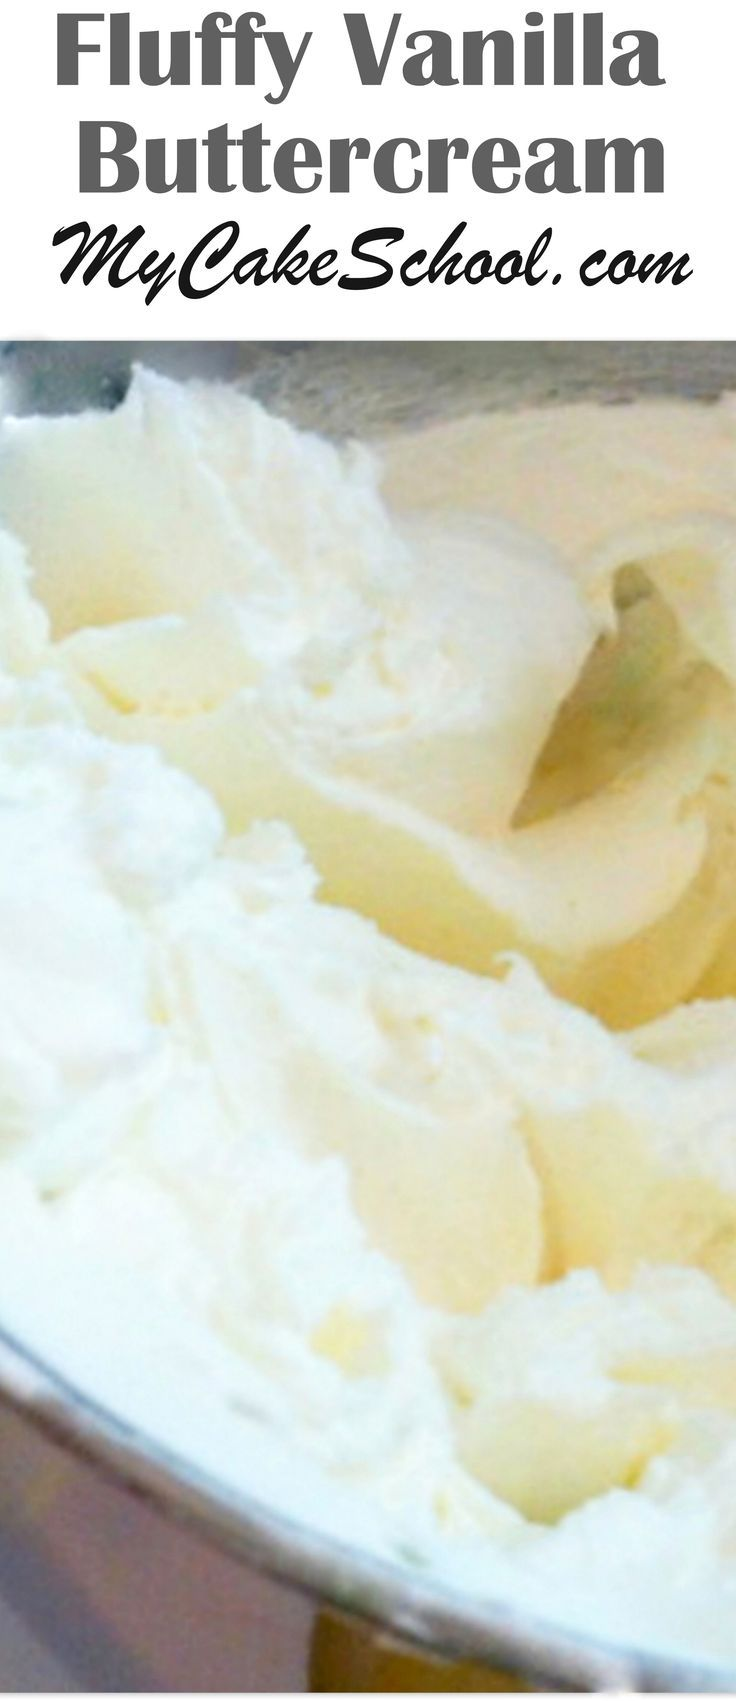 Fluffy Vanilla Buttercream Recipe- MyCakeSchool.com